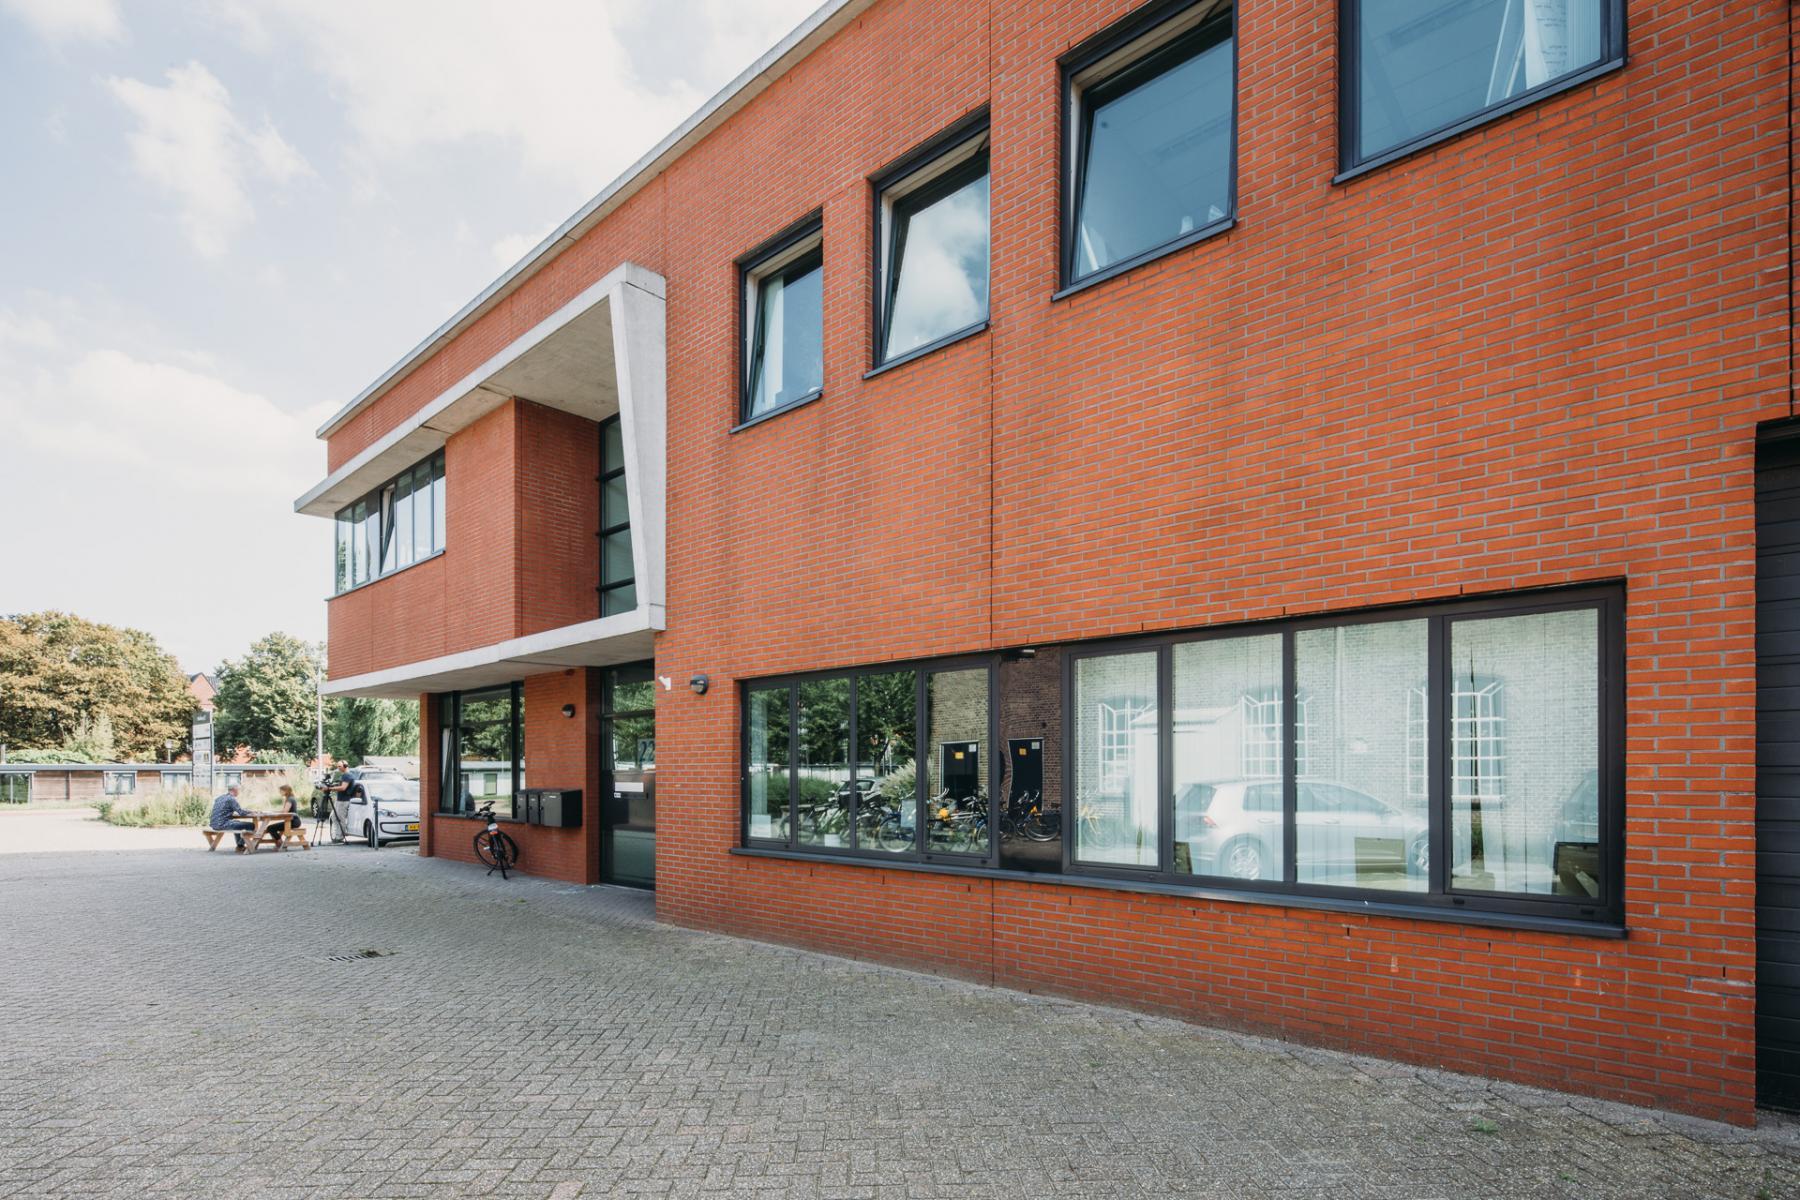 Kantoorruimte huren Kanaalweg 22, Utrecht (6)